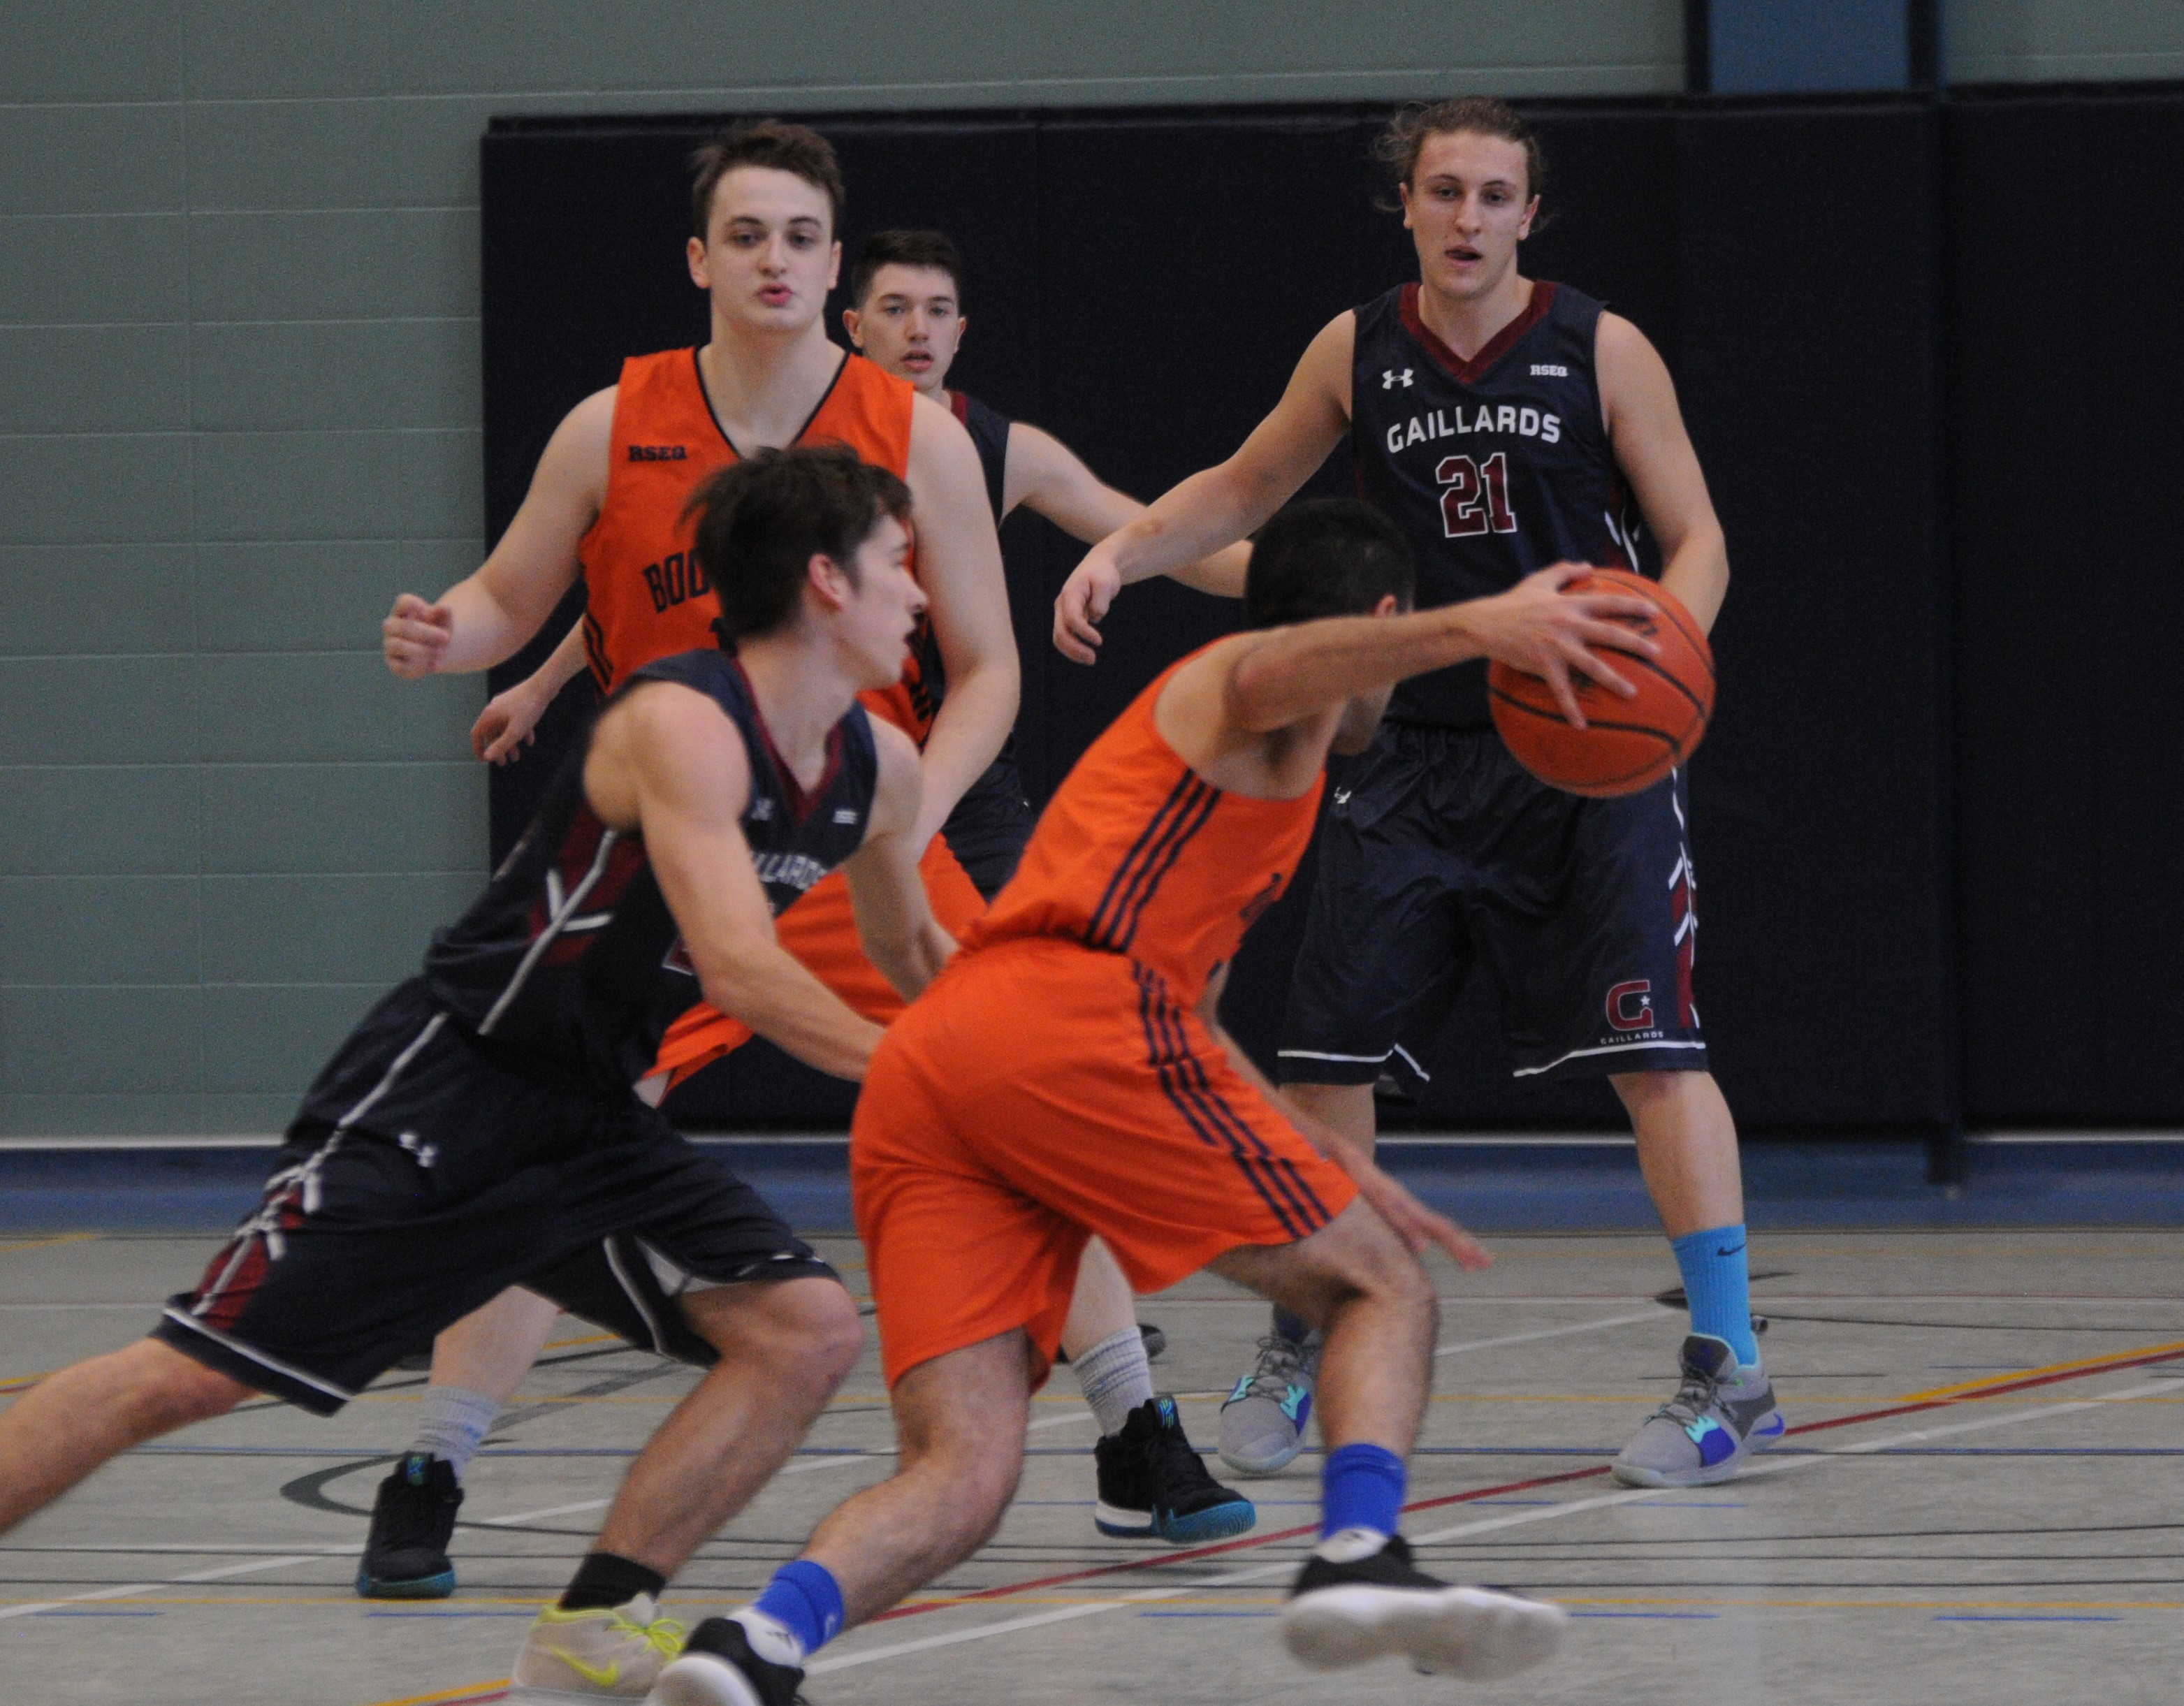 Gaillards basketball